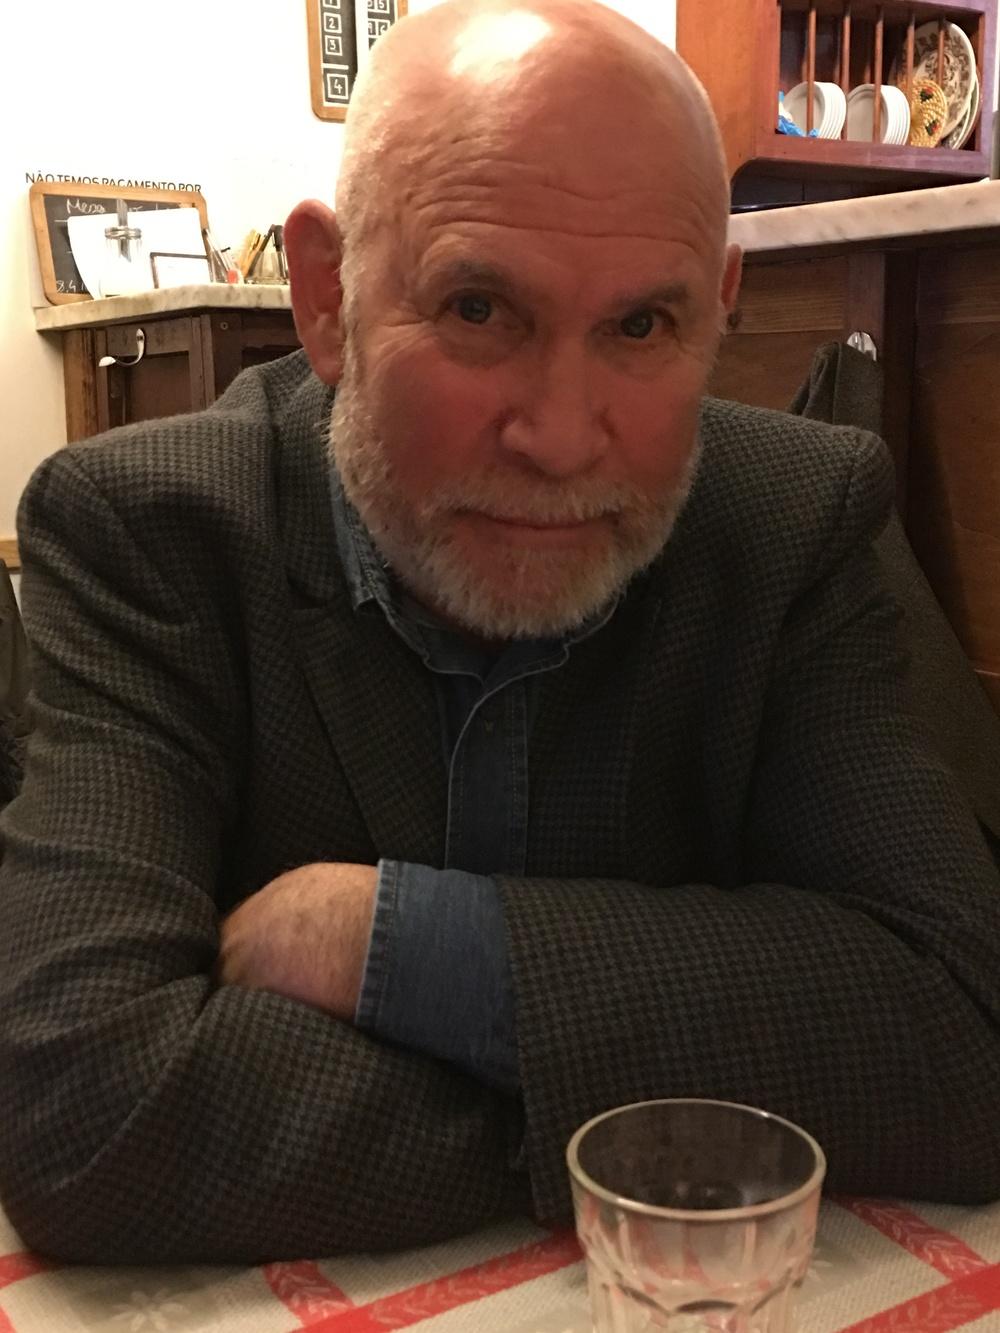 Steve McCurry at the Taberna da Rua das Flores.